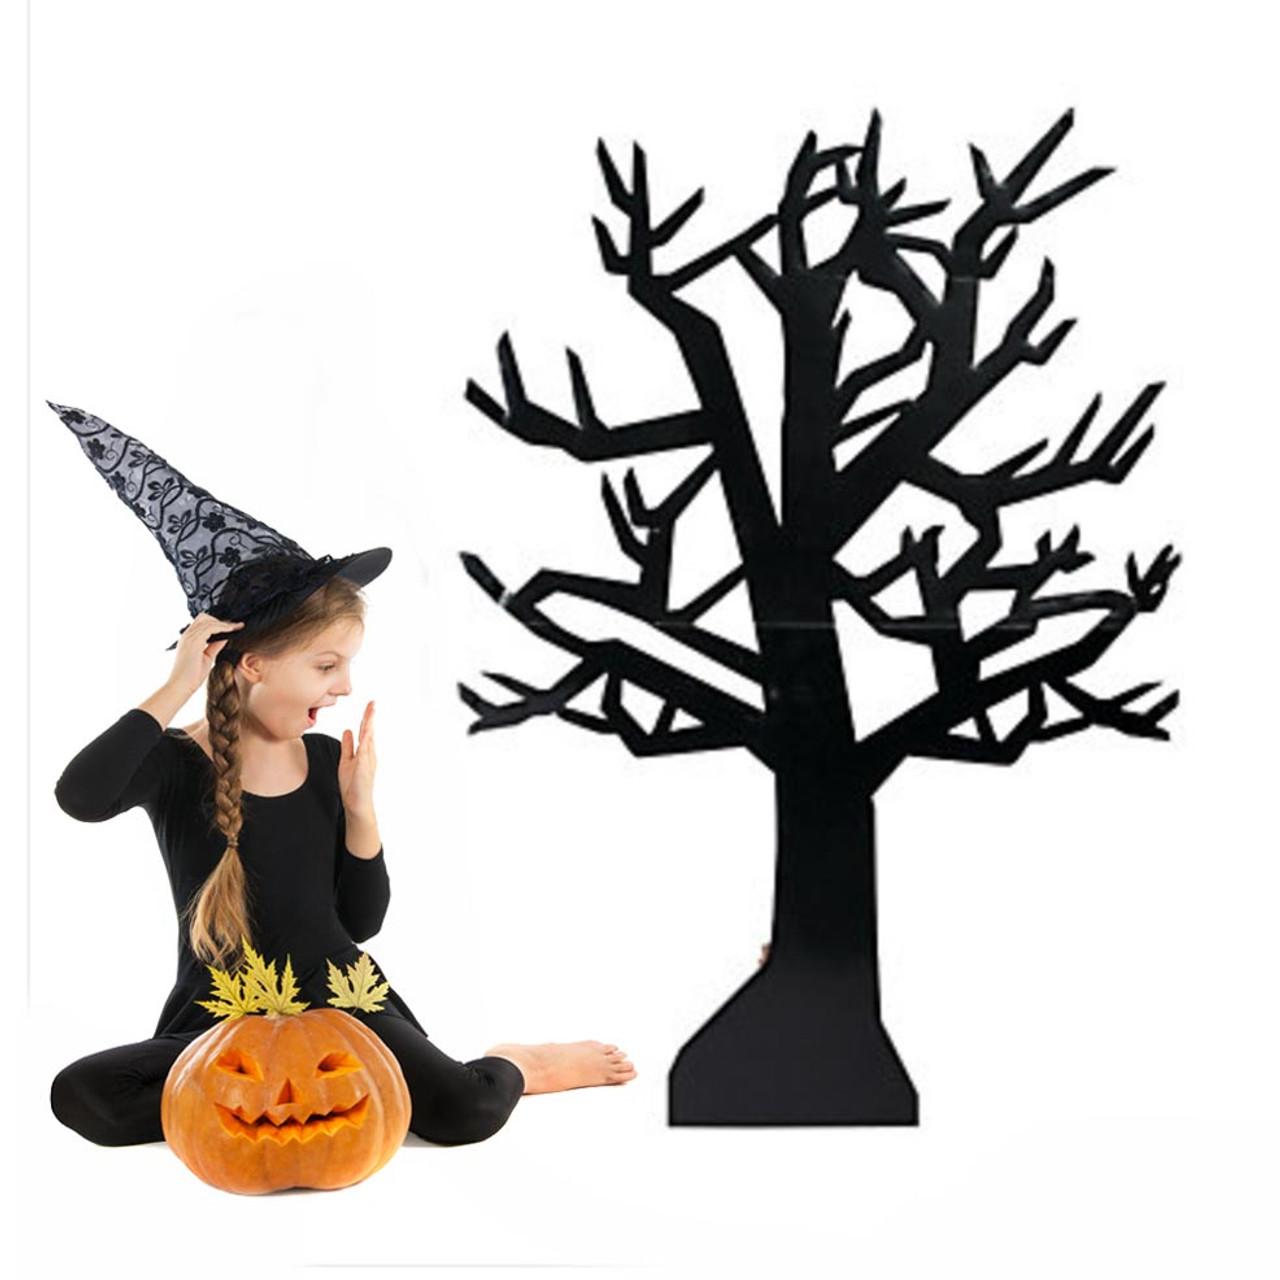 cardboard spooky tree fun unique halloween supplies